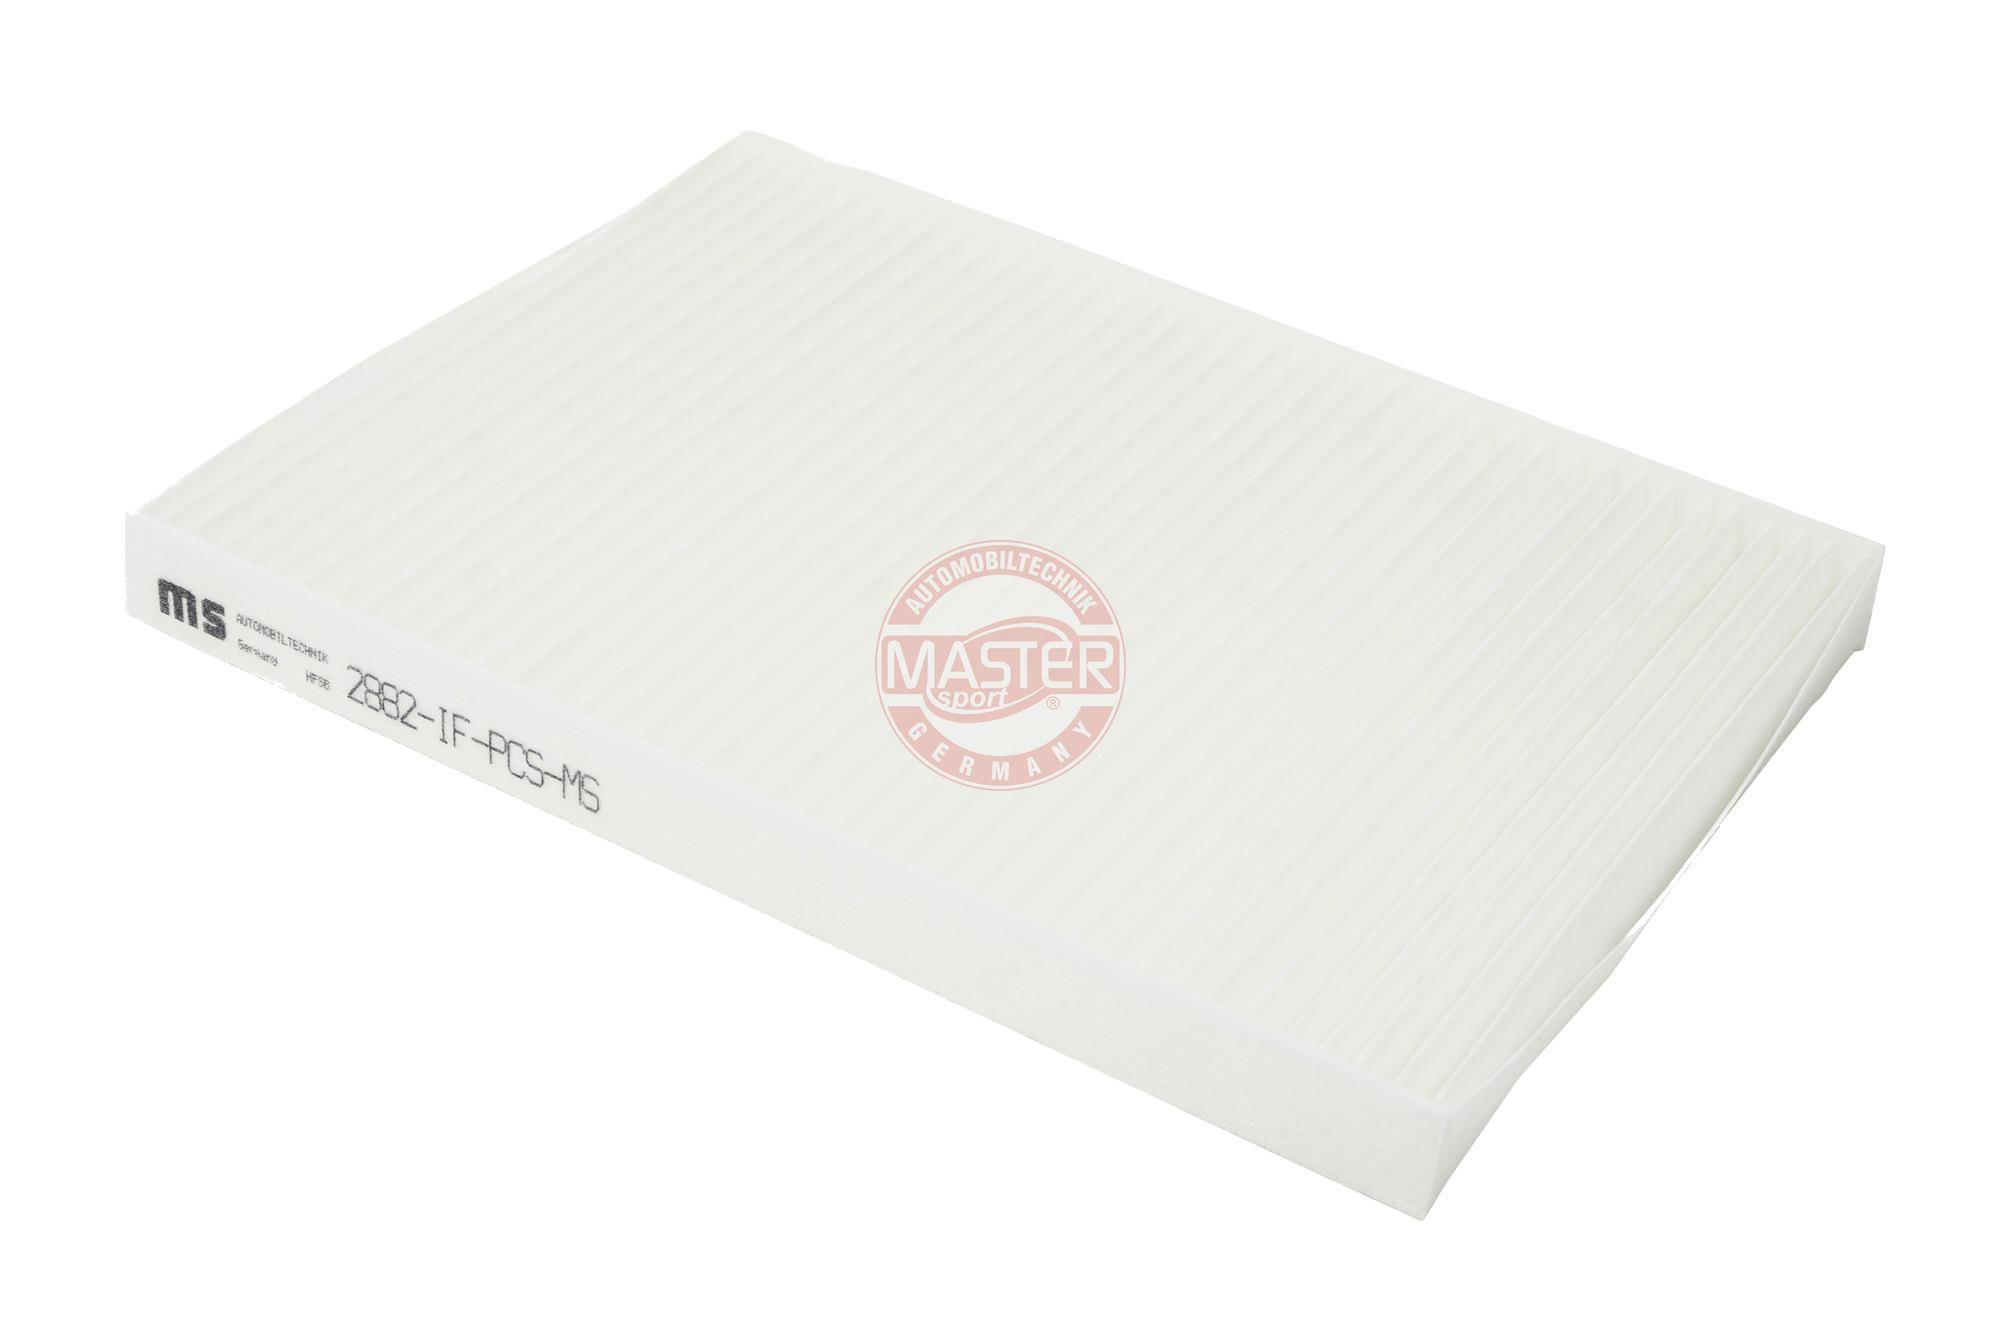 Pollen Filter 2882-IF-PCS-MS MASTER-SPORT 420028820 original quality